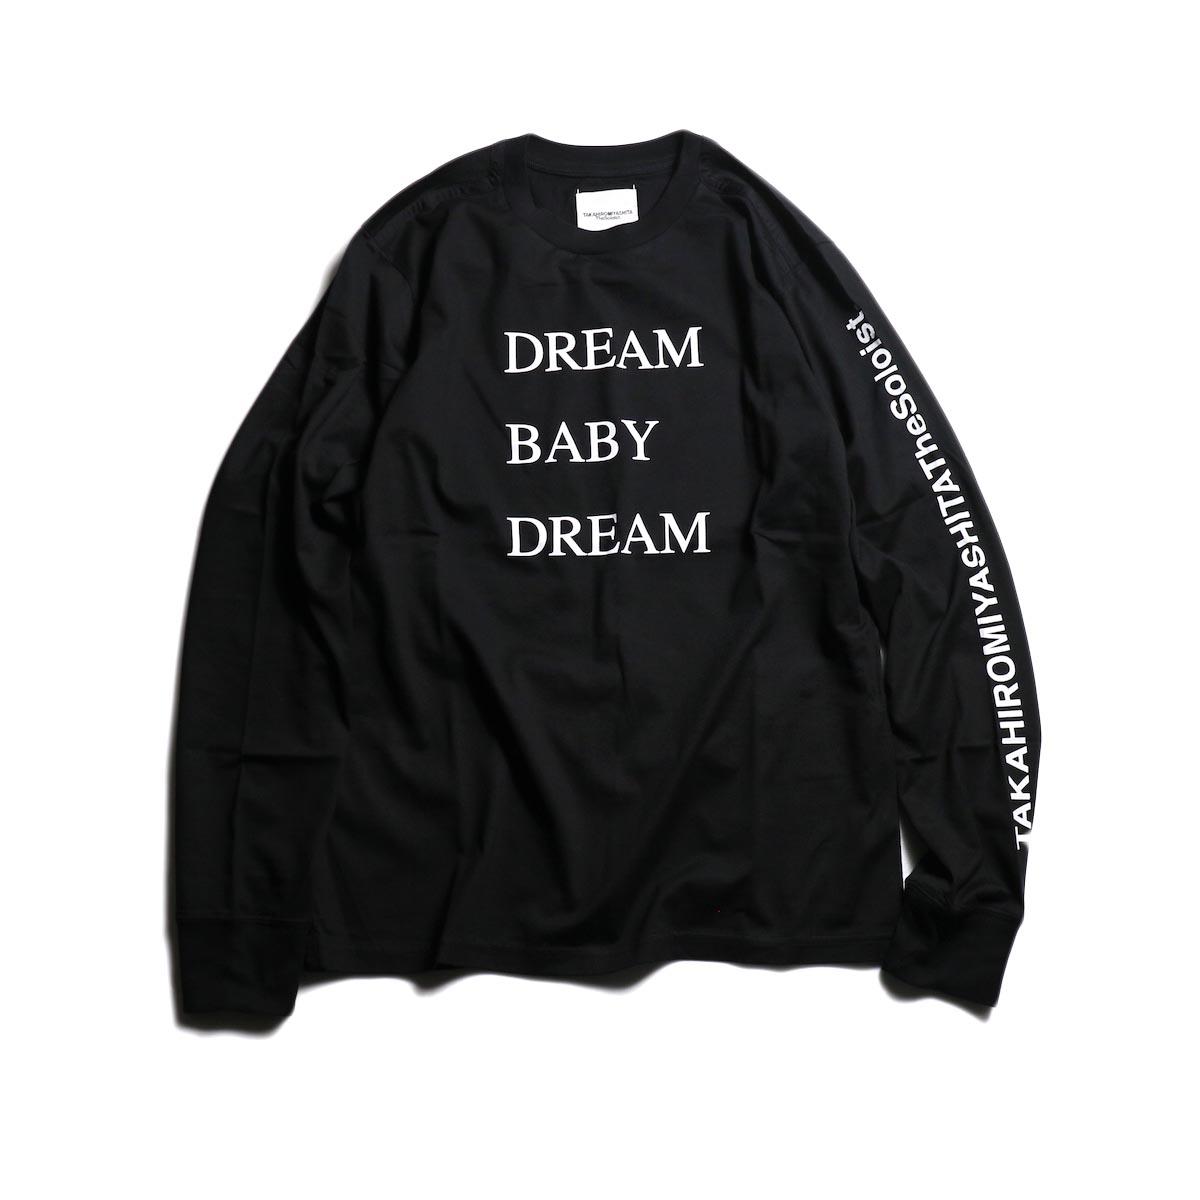 The Soloist / sc.0029AW19 DREAM BABY DREAM (long sleeve) -Black